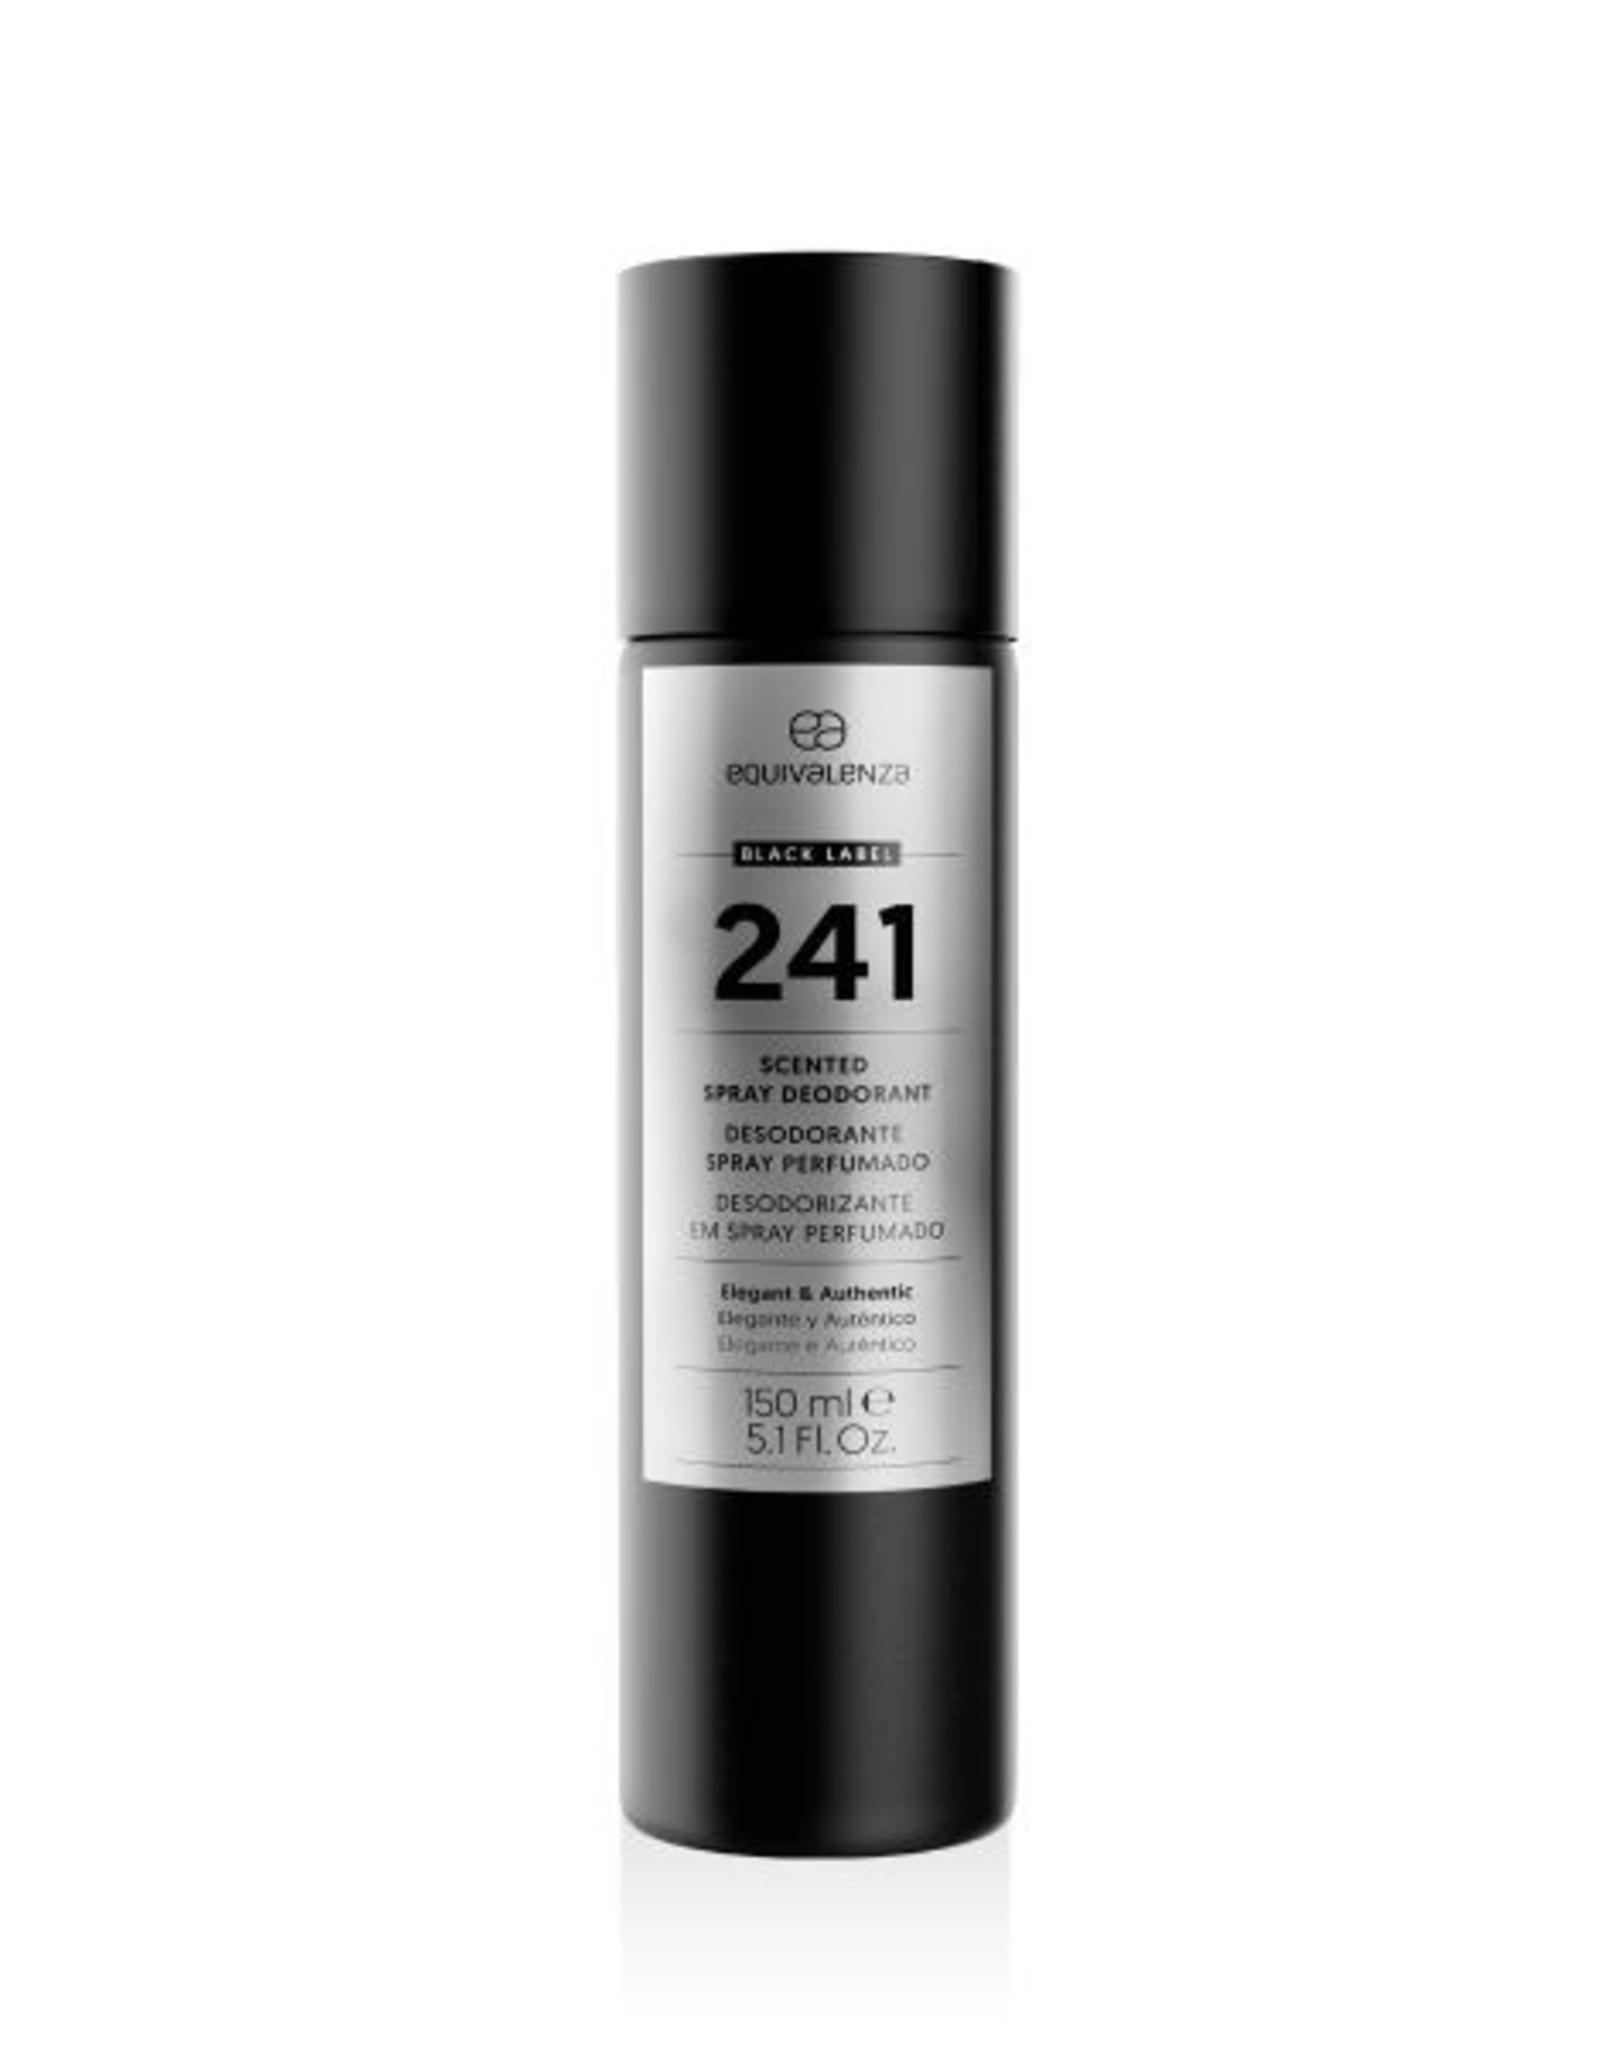 Equivalenza Black Label Deodorant 241